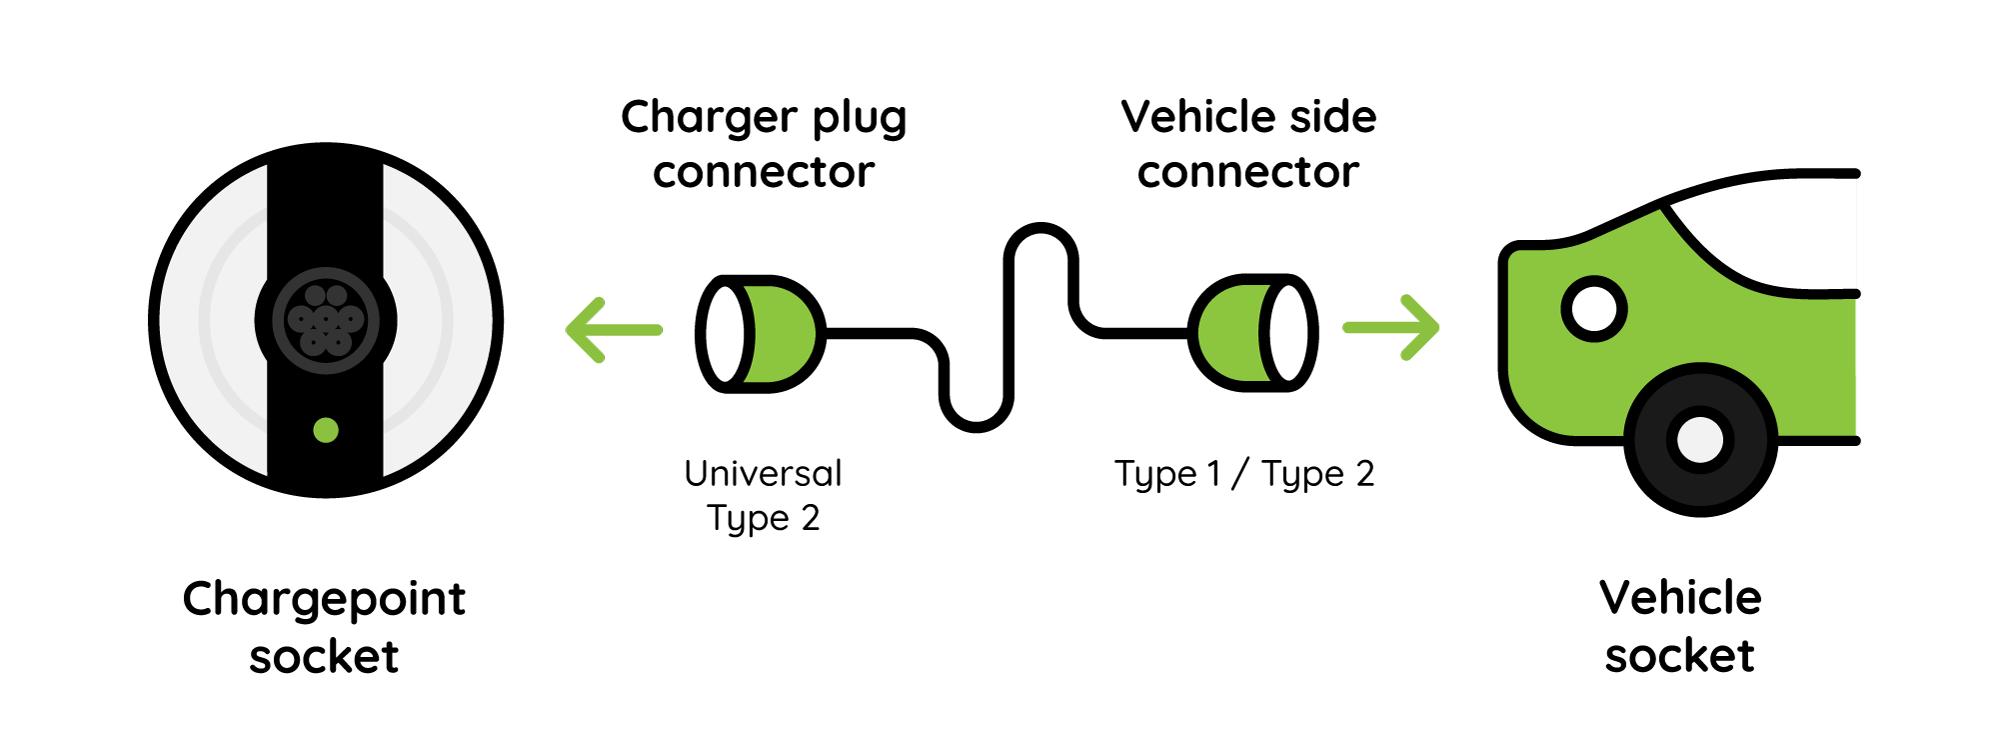 Solo Charging Connectors